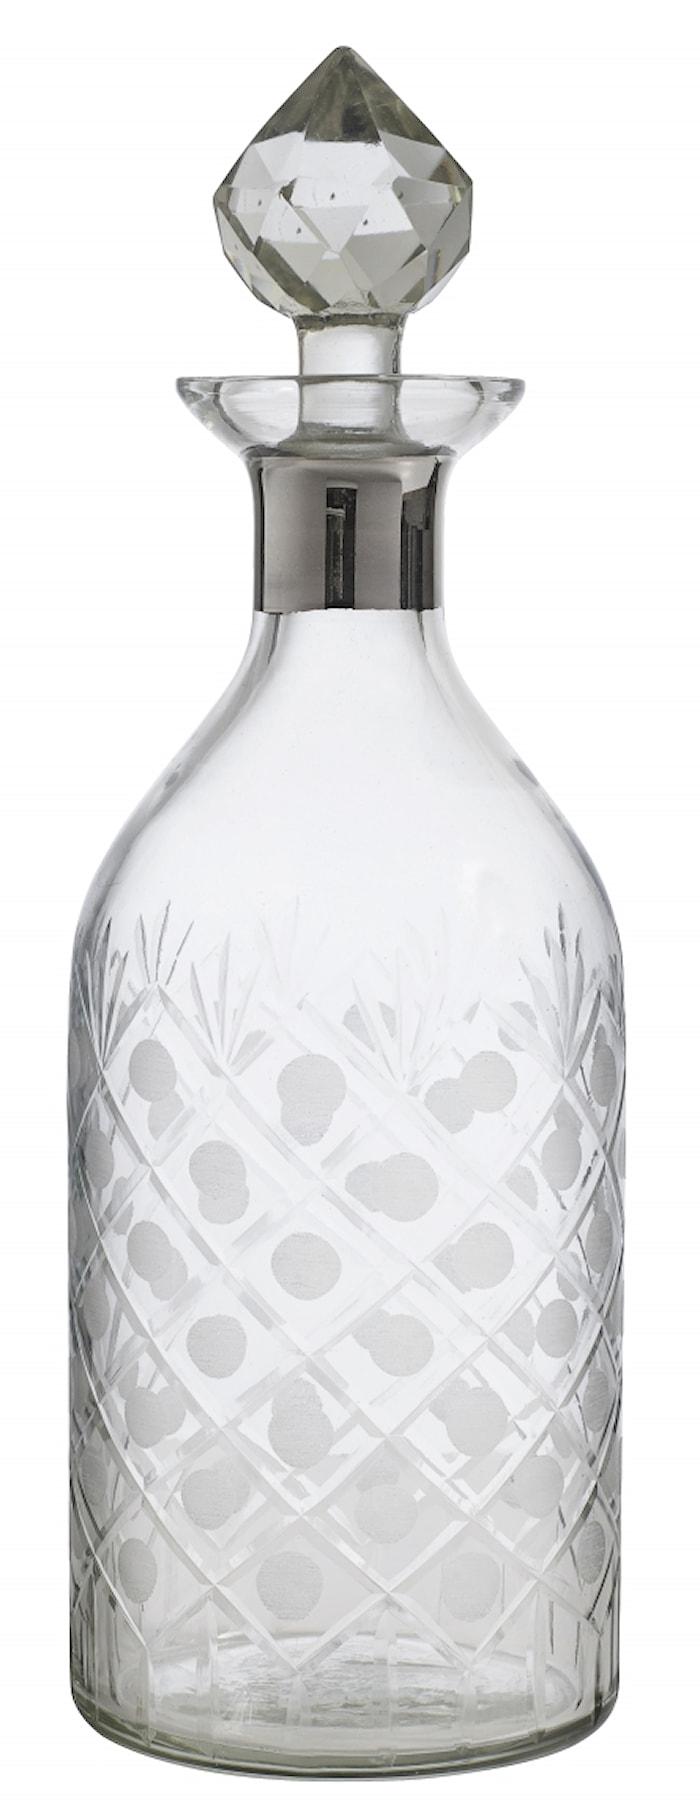 Glas decanter, rund, platinum, diamond